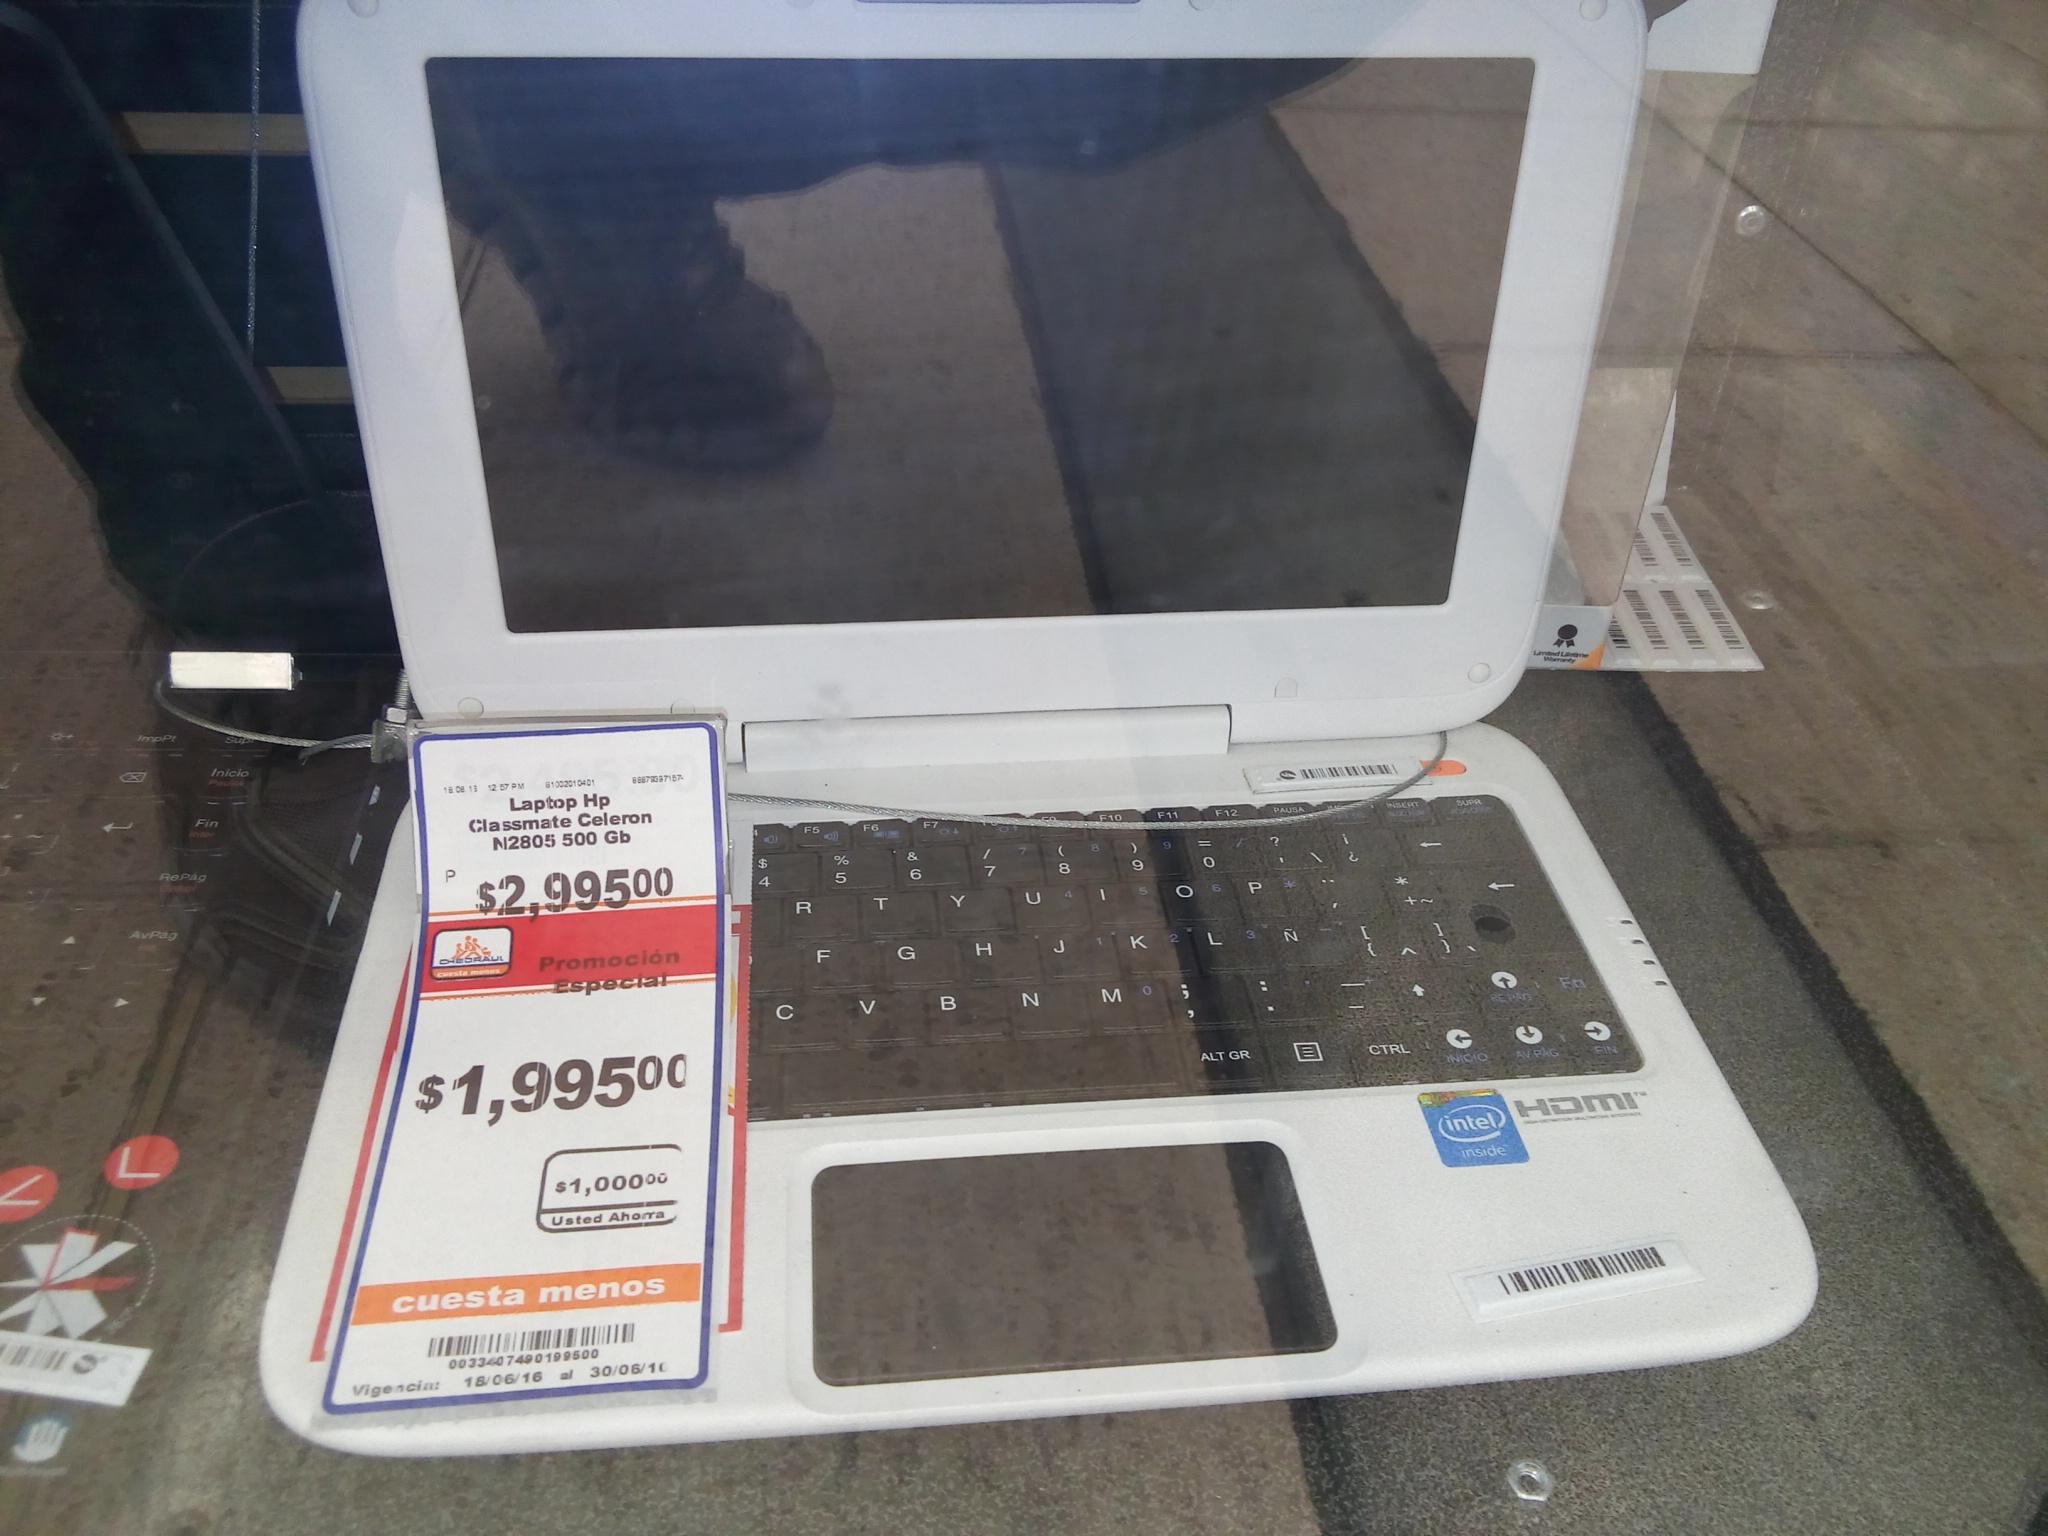 Chedraui Río Nilo Tonalá Jalisco: Mini laptop HP N2805 a $1,995